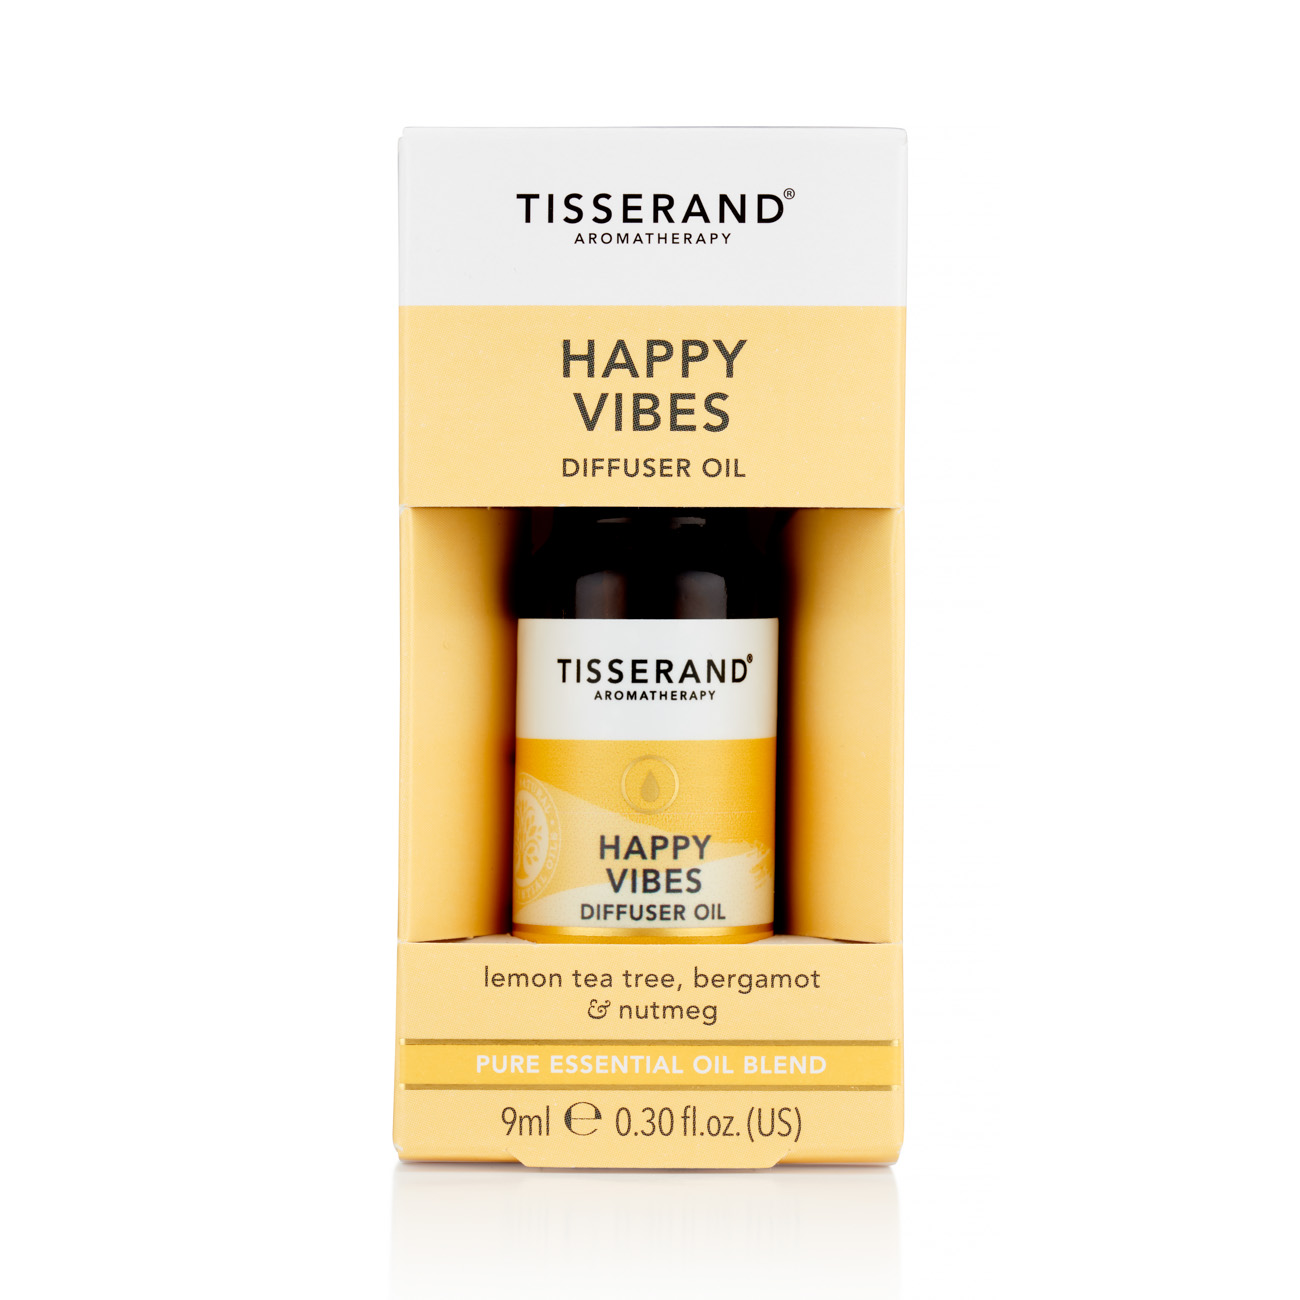 Happy Vibes Diffuser Oil 9ml